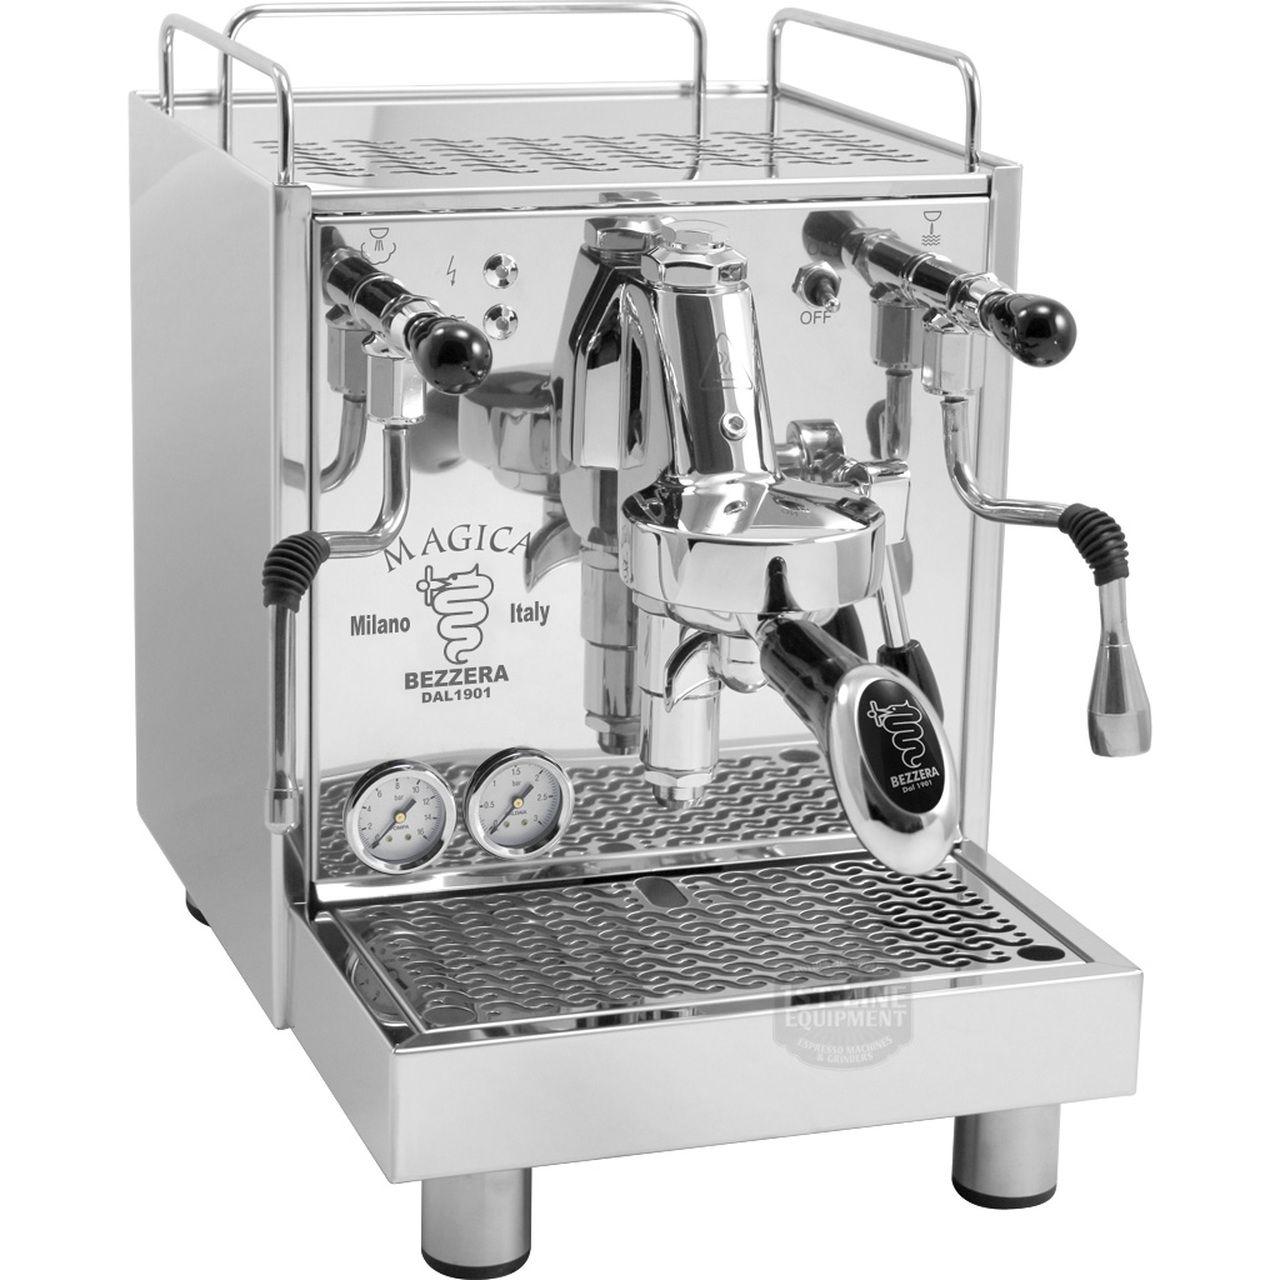 Bezzera Magica v2 Espresso Machine Commercial espresso